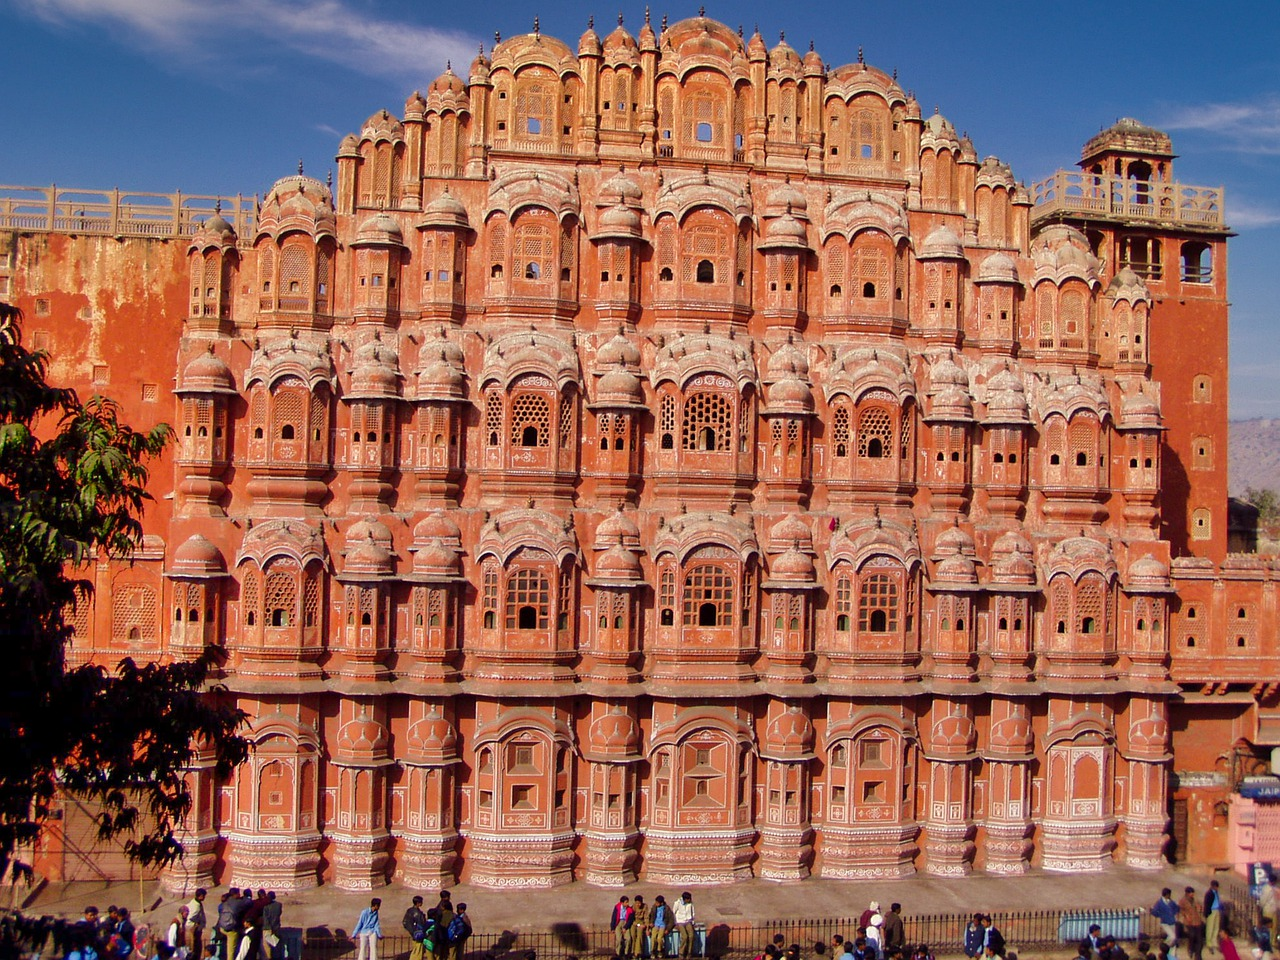 Visit Hawa Mahal in Jaipur: The Top Tourist Destinations of Rajasthan